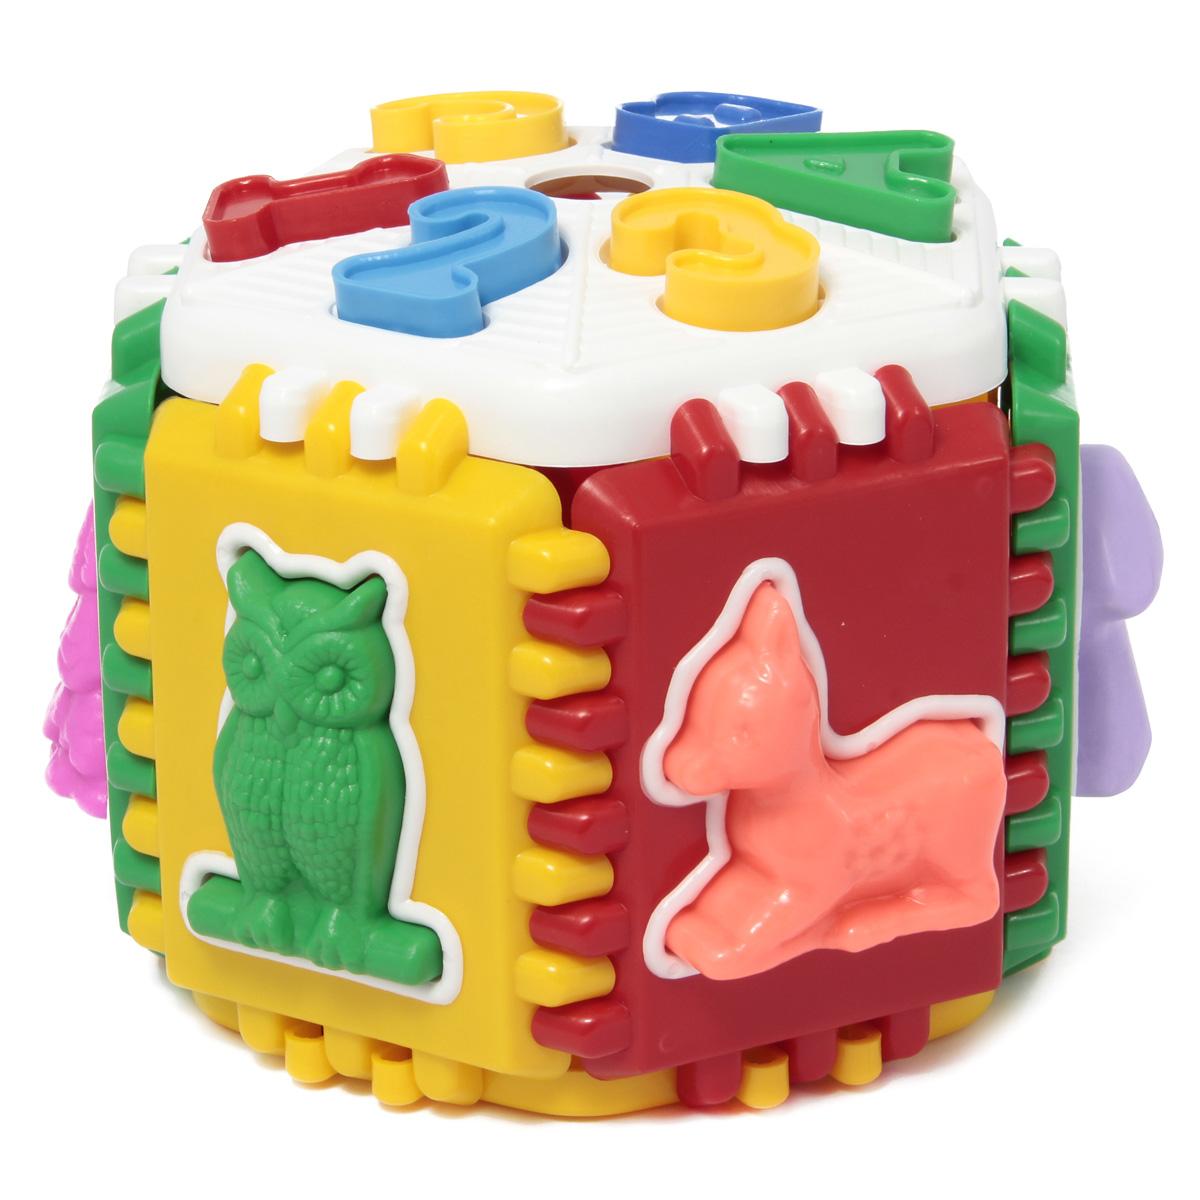 Развивающая игрушка Логика лесная школа/26 игрушка развивающая логический квадрат артикул д020